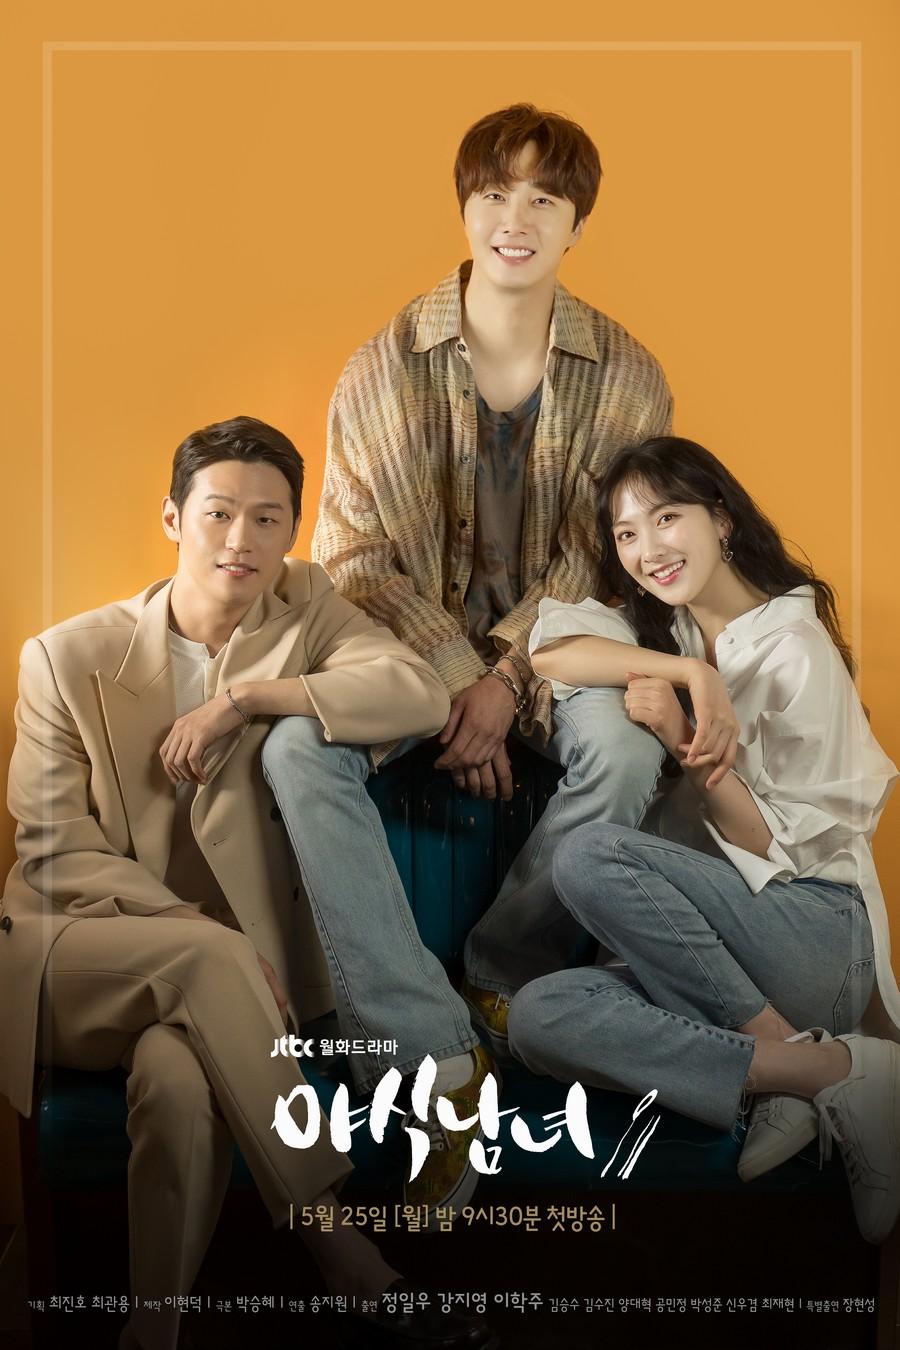 "2020 Sweet Munchies الدراما الكورية ""وجبات خفيفة حلوة"". تقرير عن الدراما + الأبطال + جميع الحلقات مترجمة أونلاين . مسلسل وجبات خفيفة حلوة مترجم"